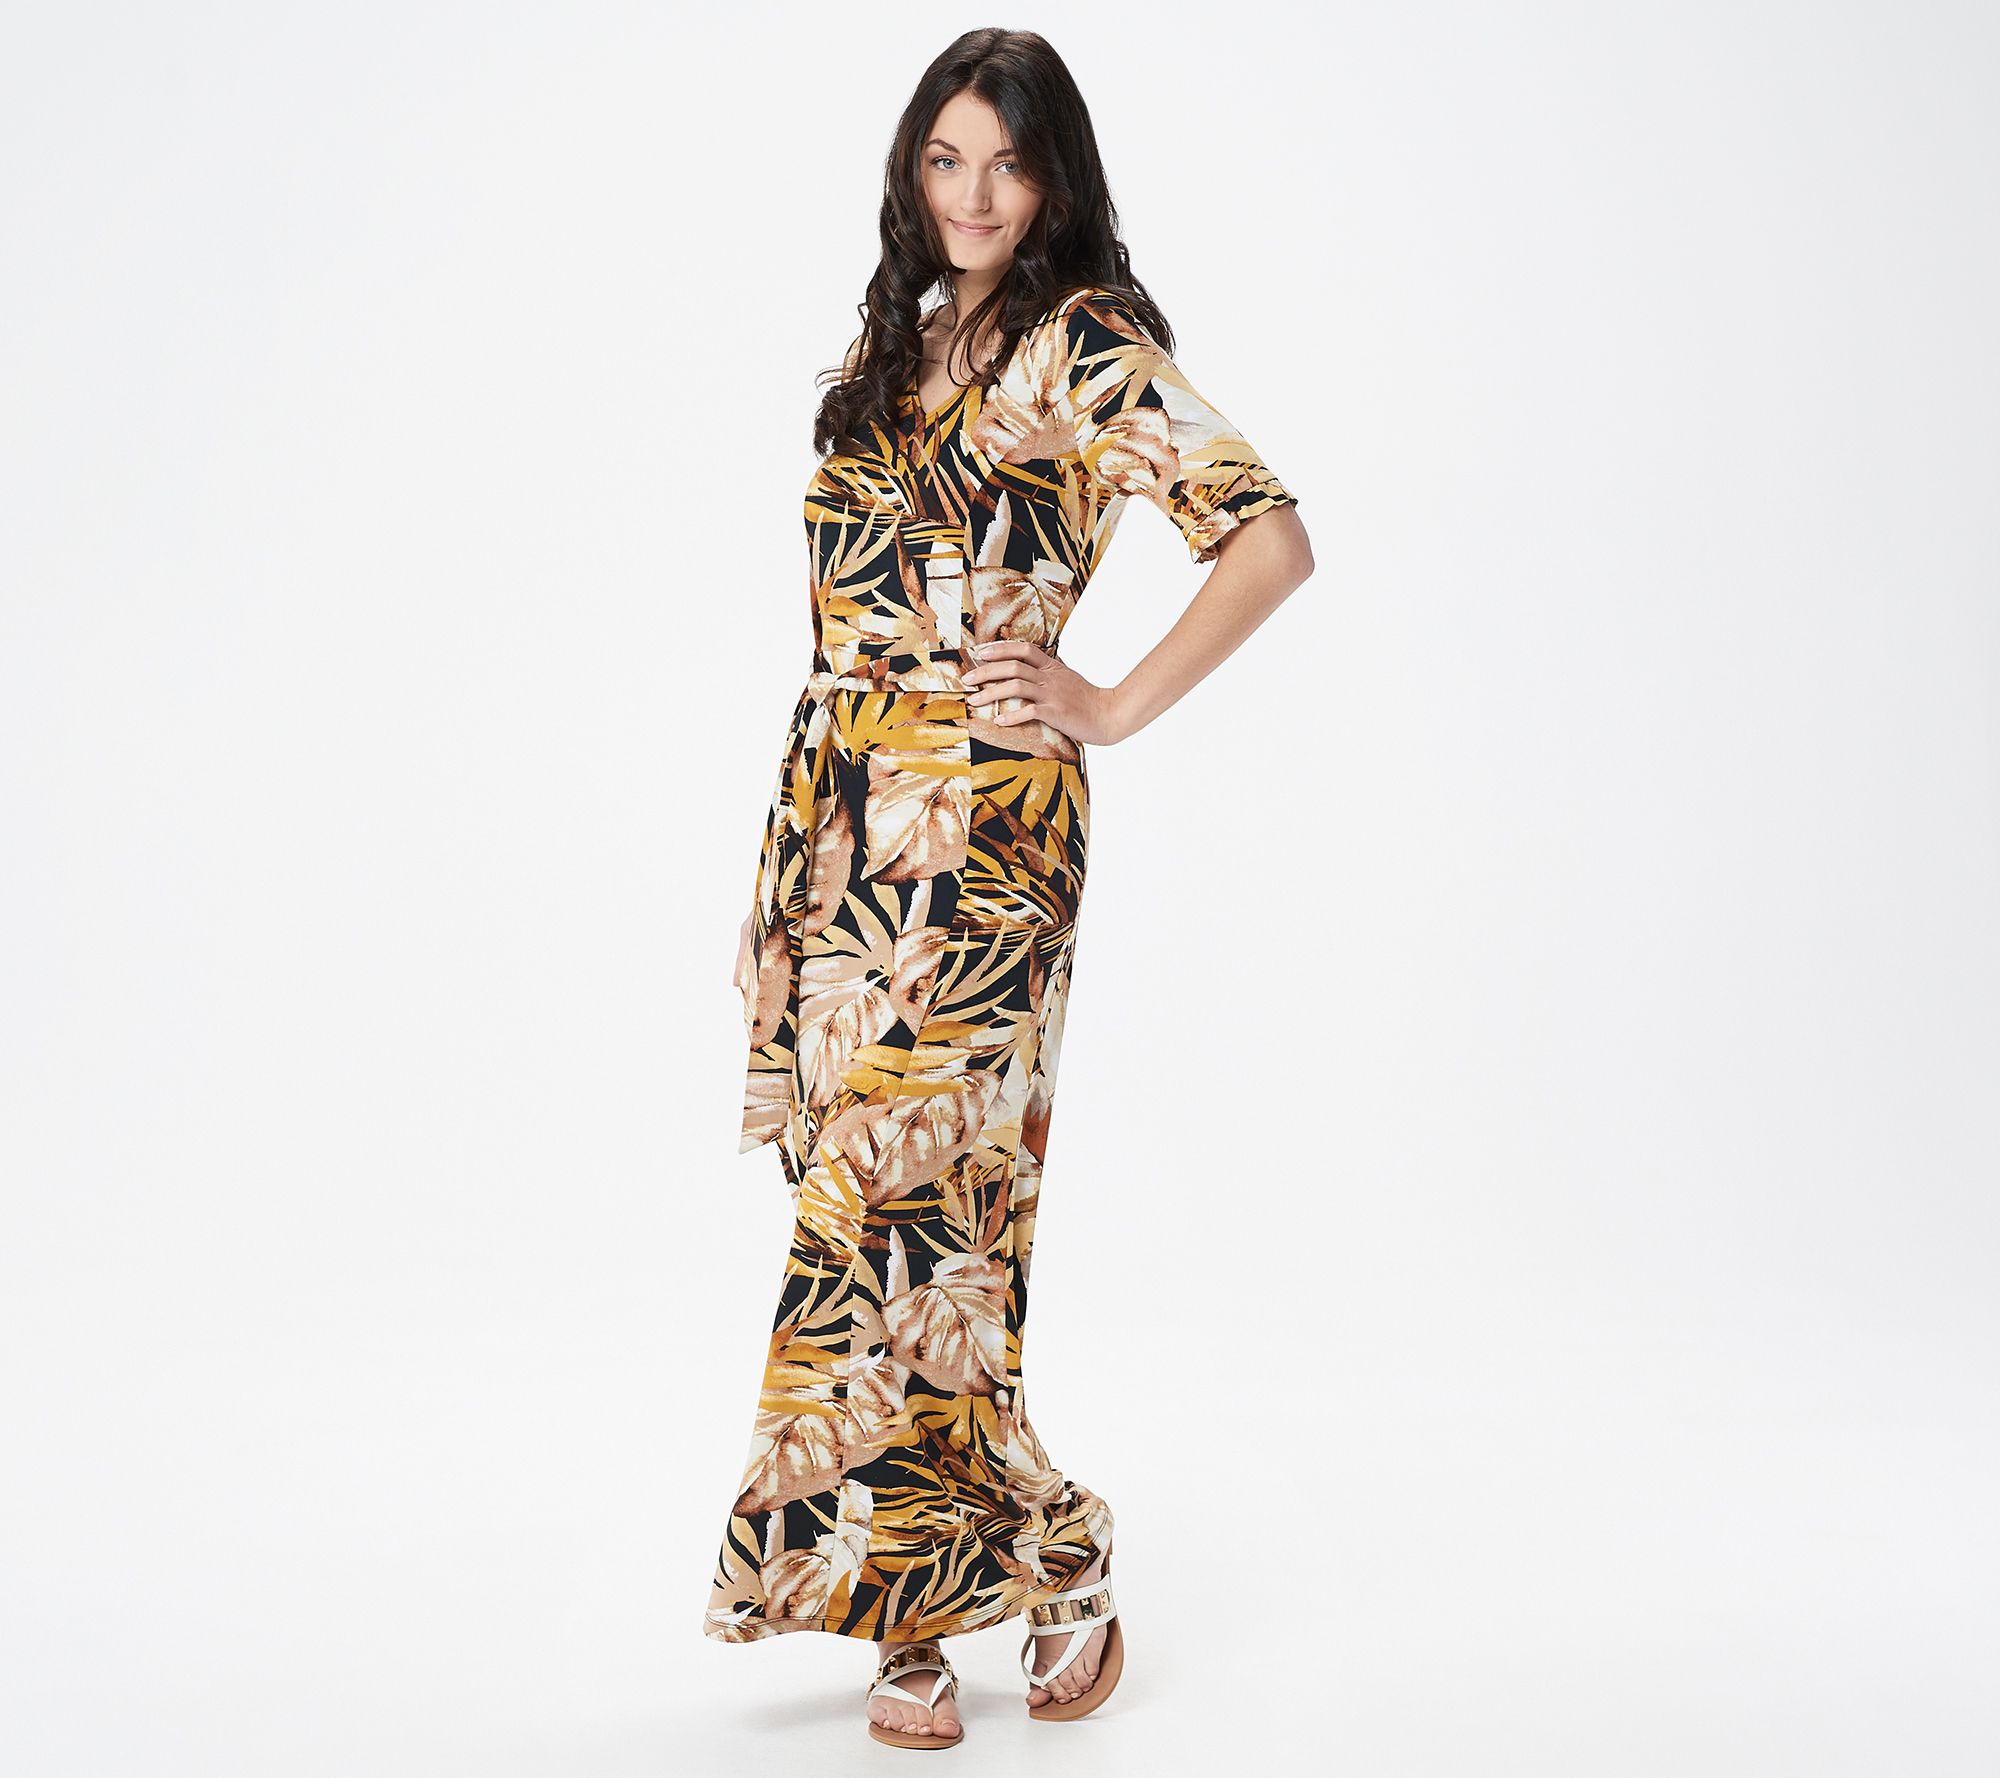 502c47c1a1 Susan Graver Petite Printed Liquid Knit Maxi Dress with Belt - Page 1 —  QVC.com